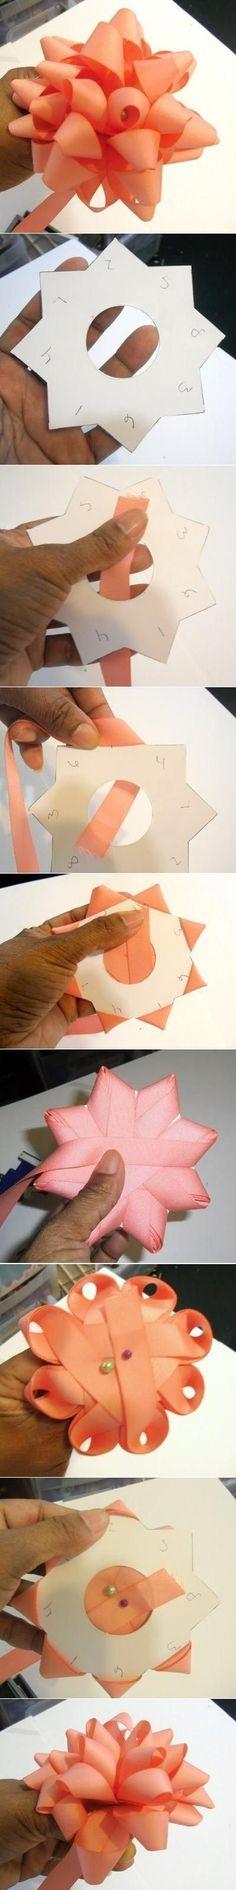 DIY Bow of Ribbon.jpg